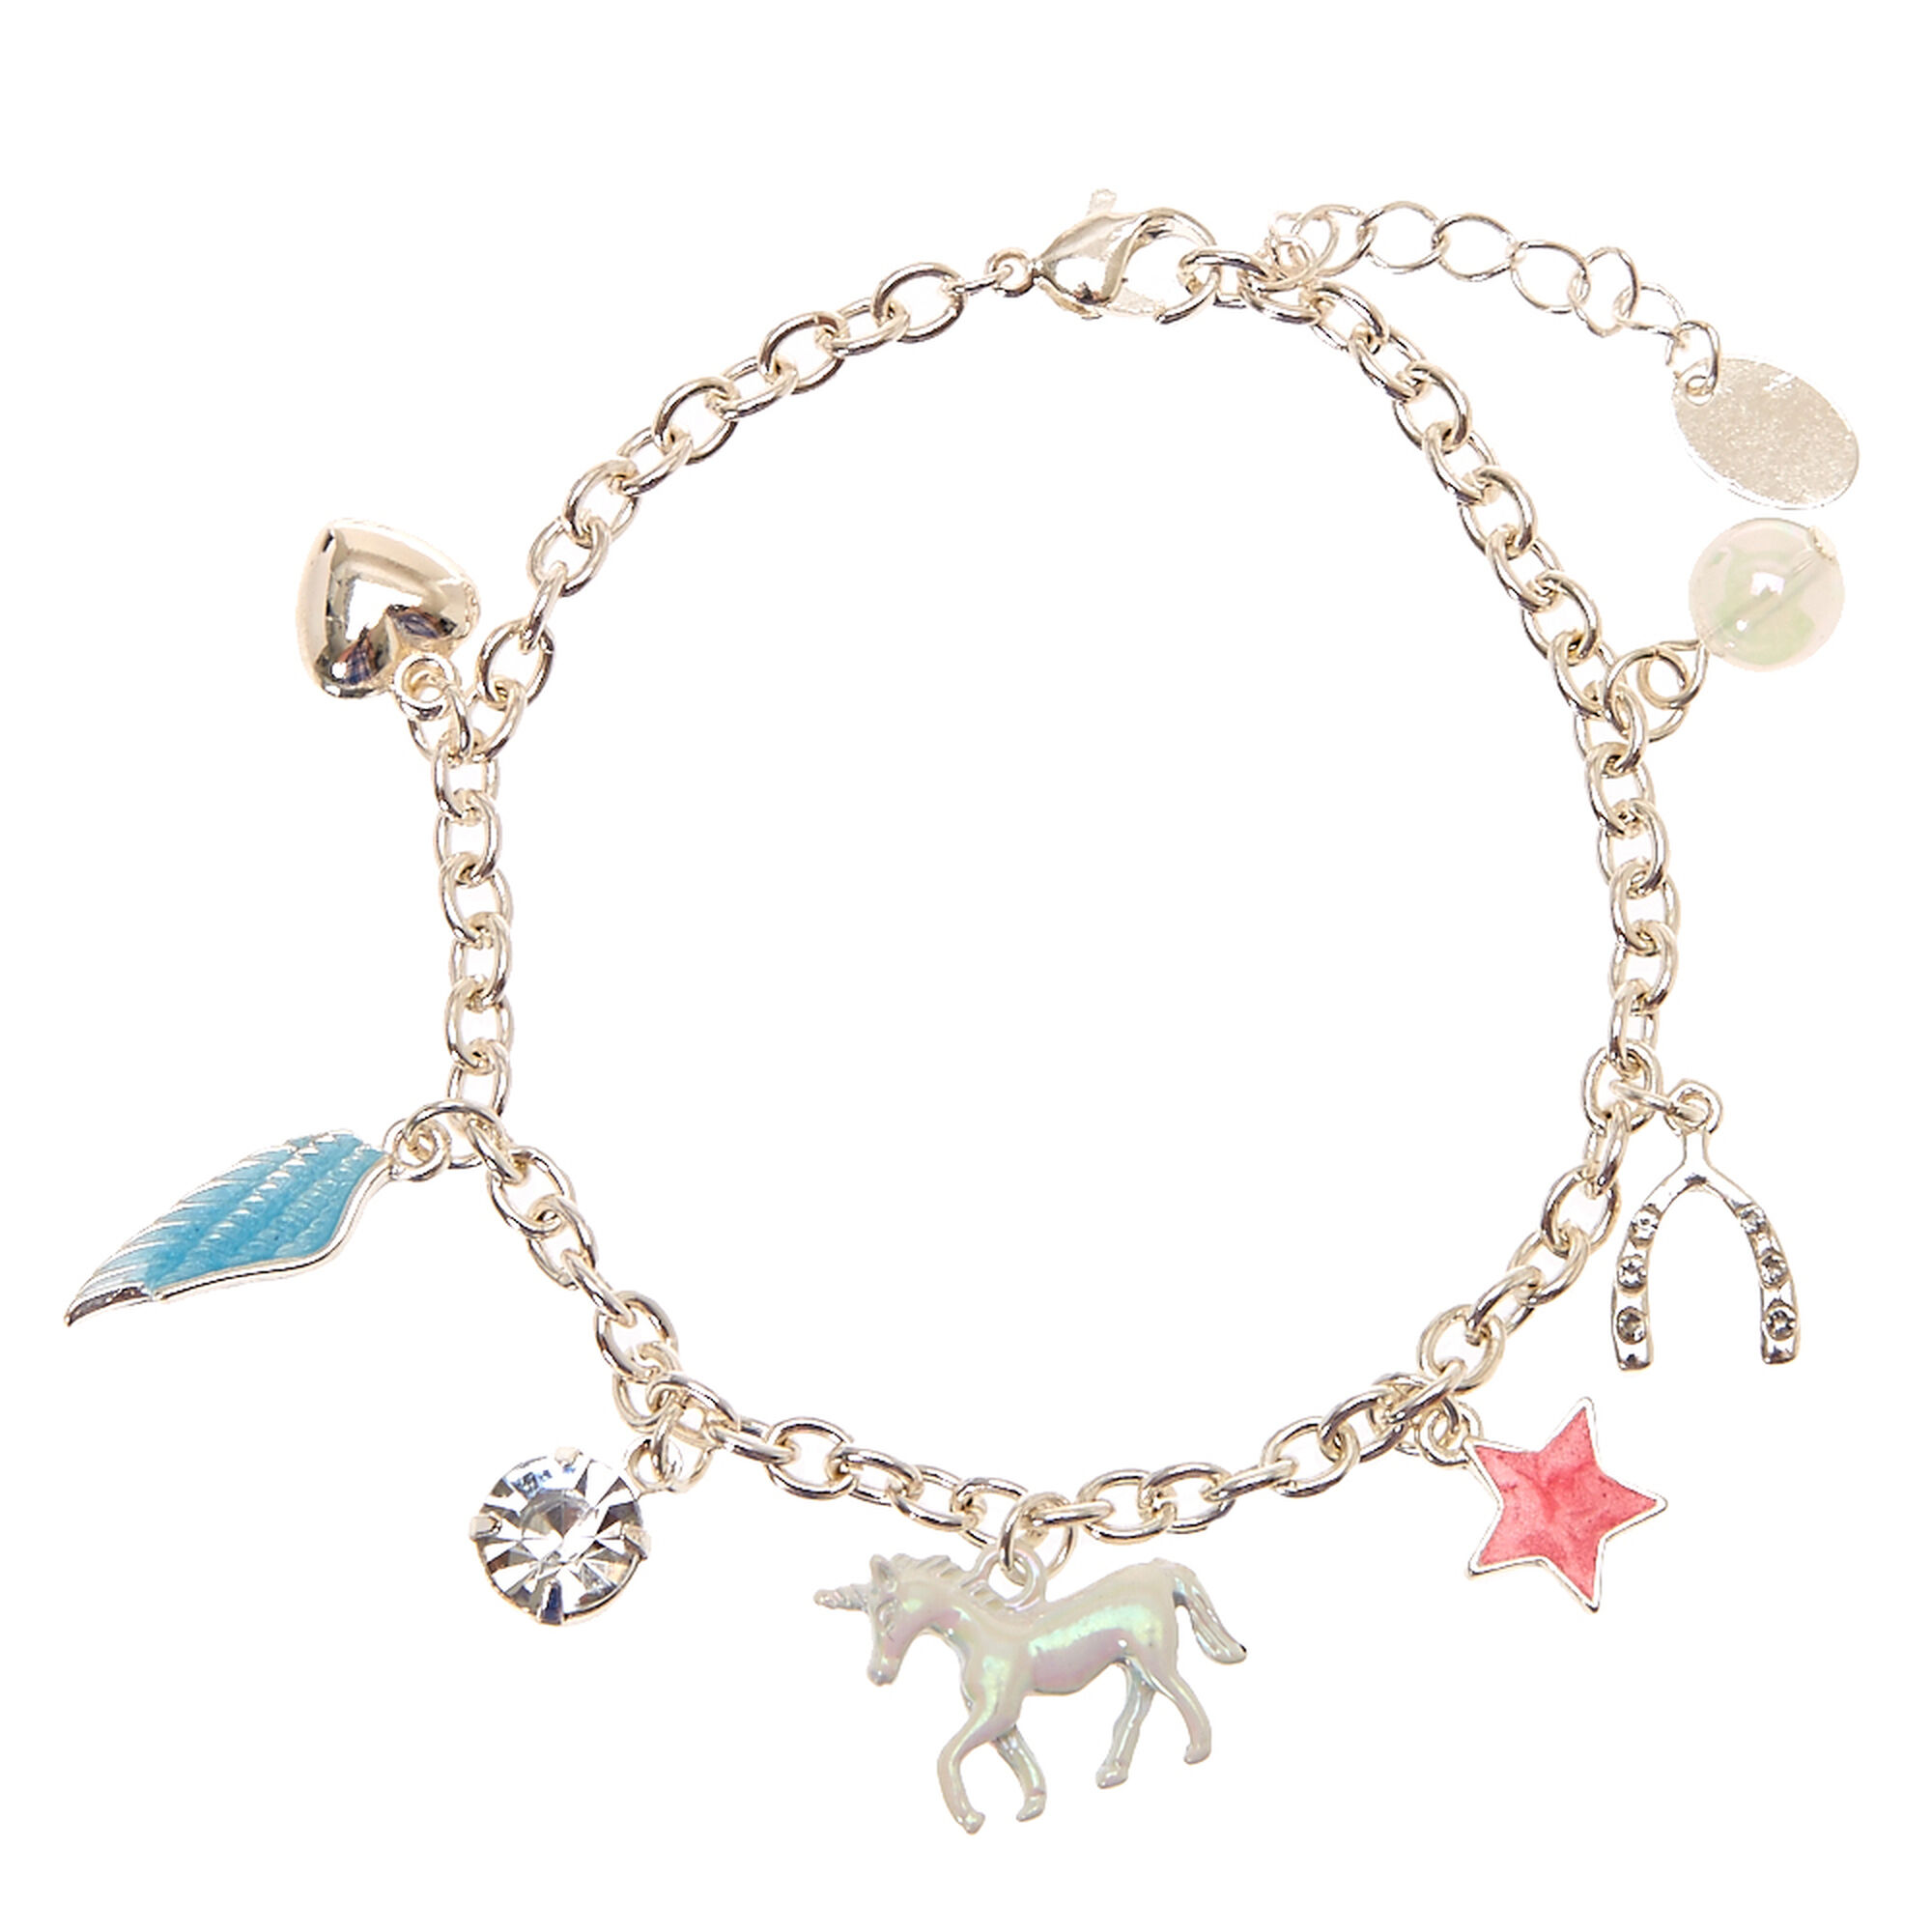 Unicorn Dream Charm Bracelet  Claire's Us. Red Stone Engagement Rings. Celtic Lockets. Bar Light Pendant. Popular Necklace. Pink Diamond. Sterling Silver Bangle Bracelets. Broken Wedding Rings. Sapphire Bands